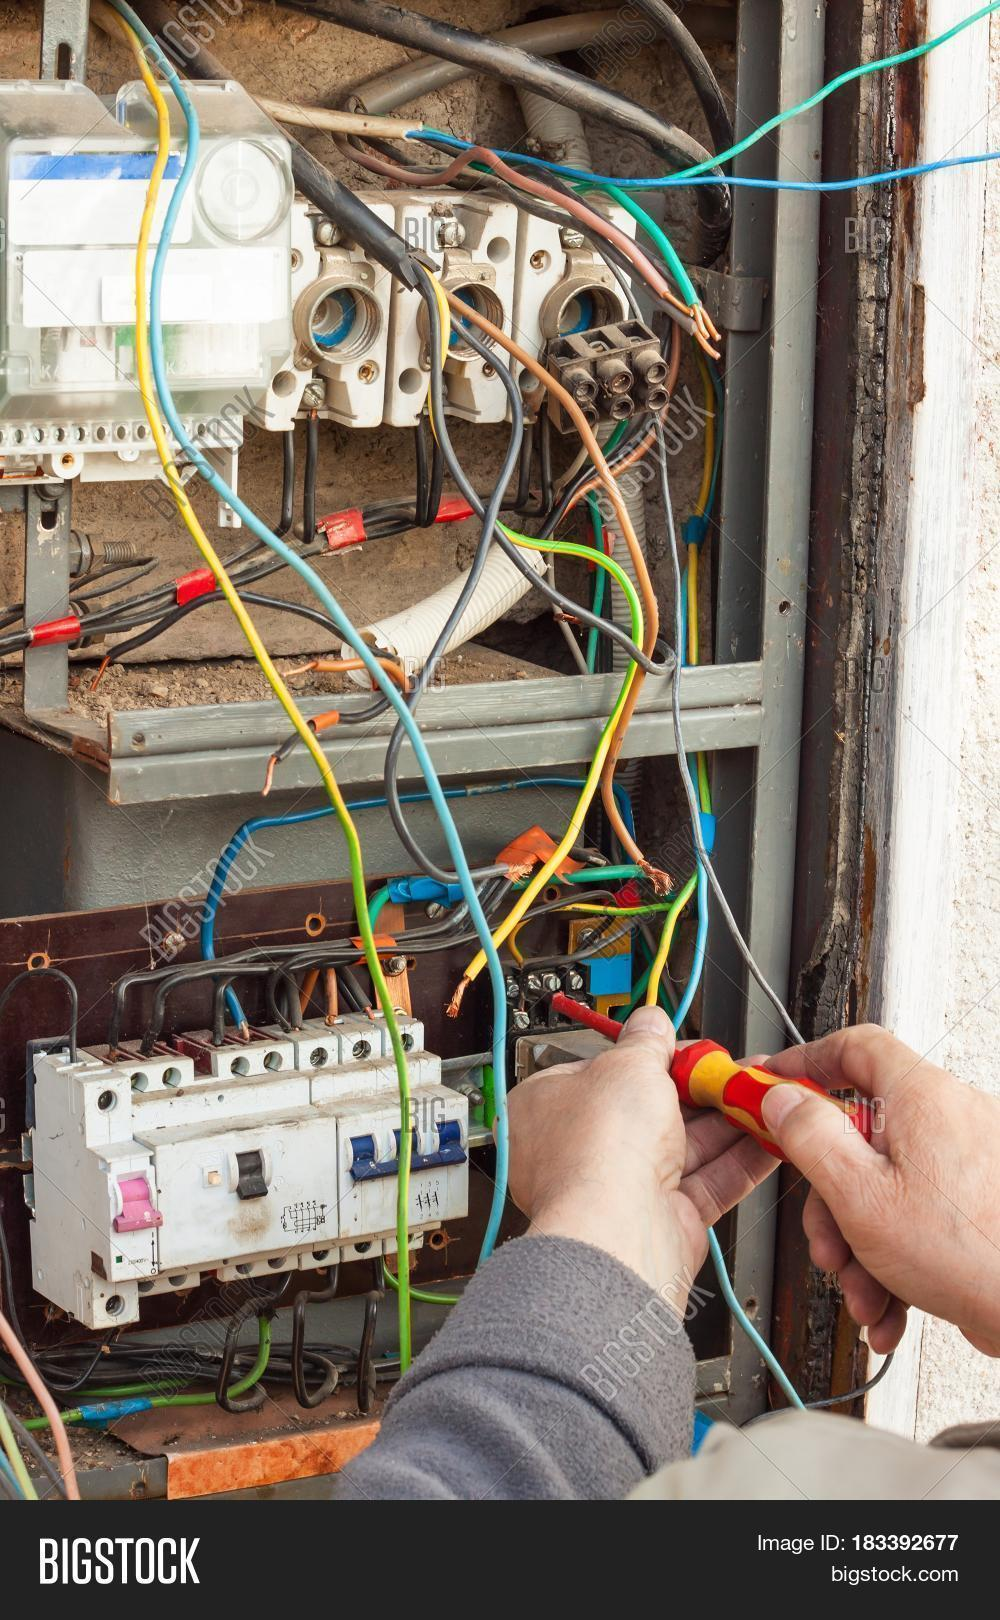 Repair Old Electrical Image & Photo (Free Trial)   Bigstock